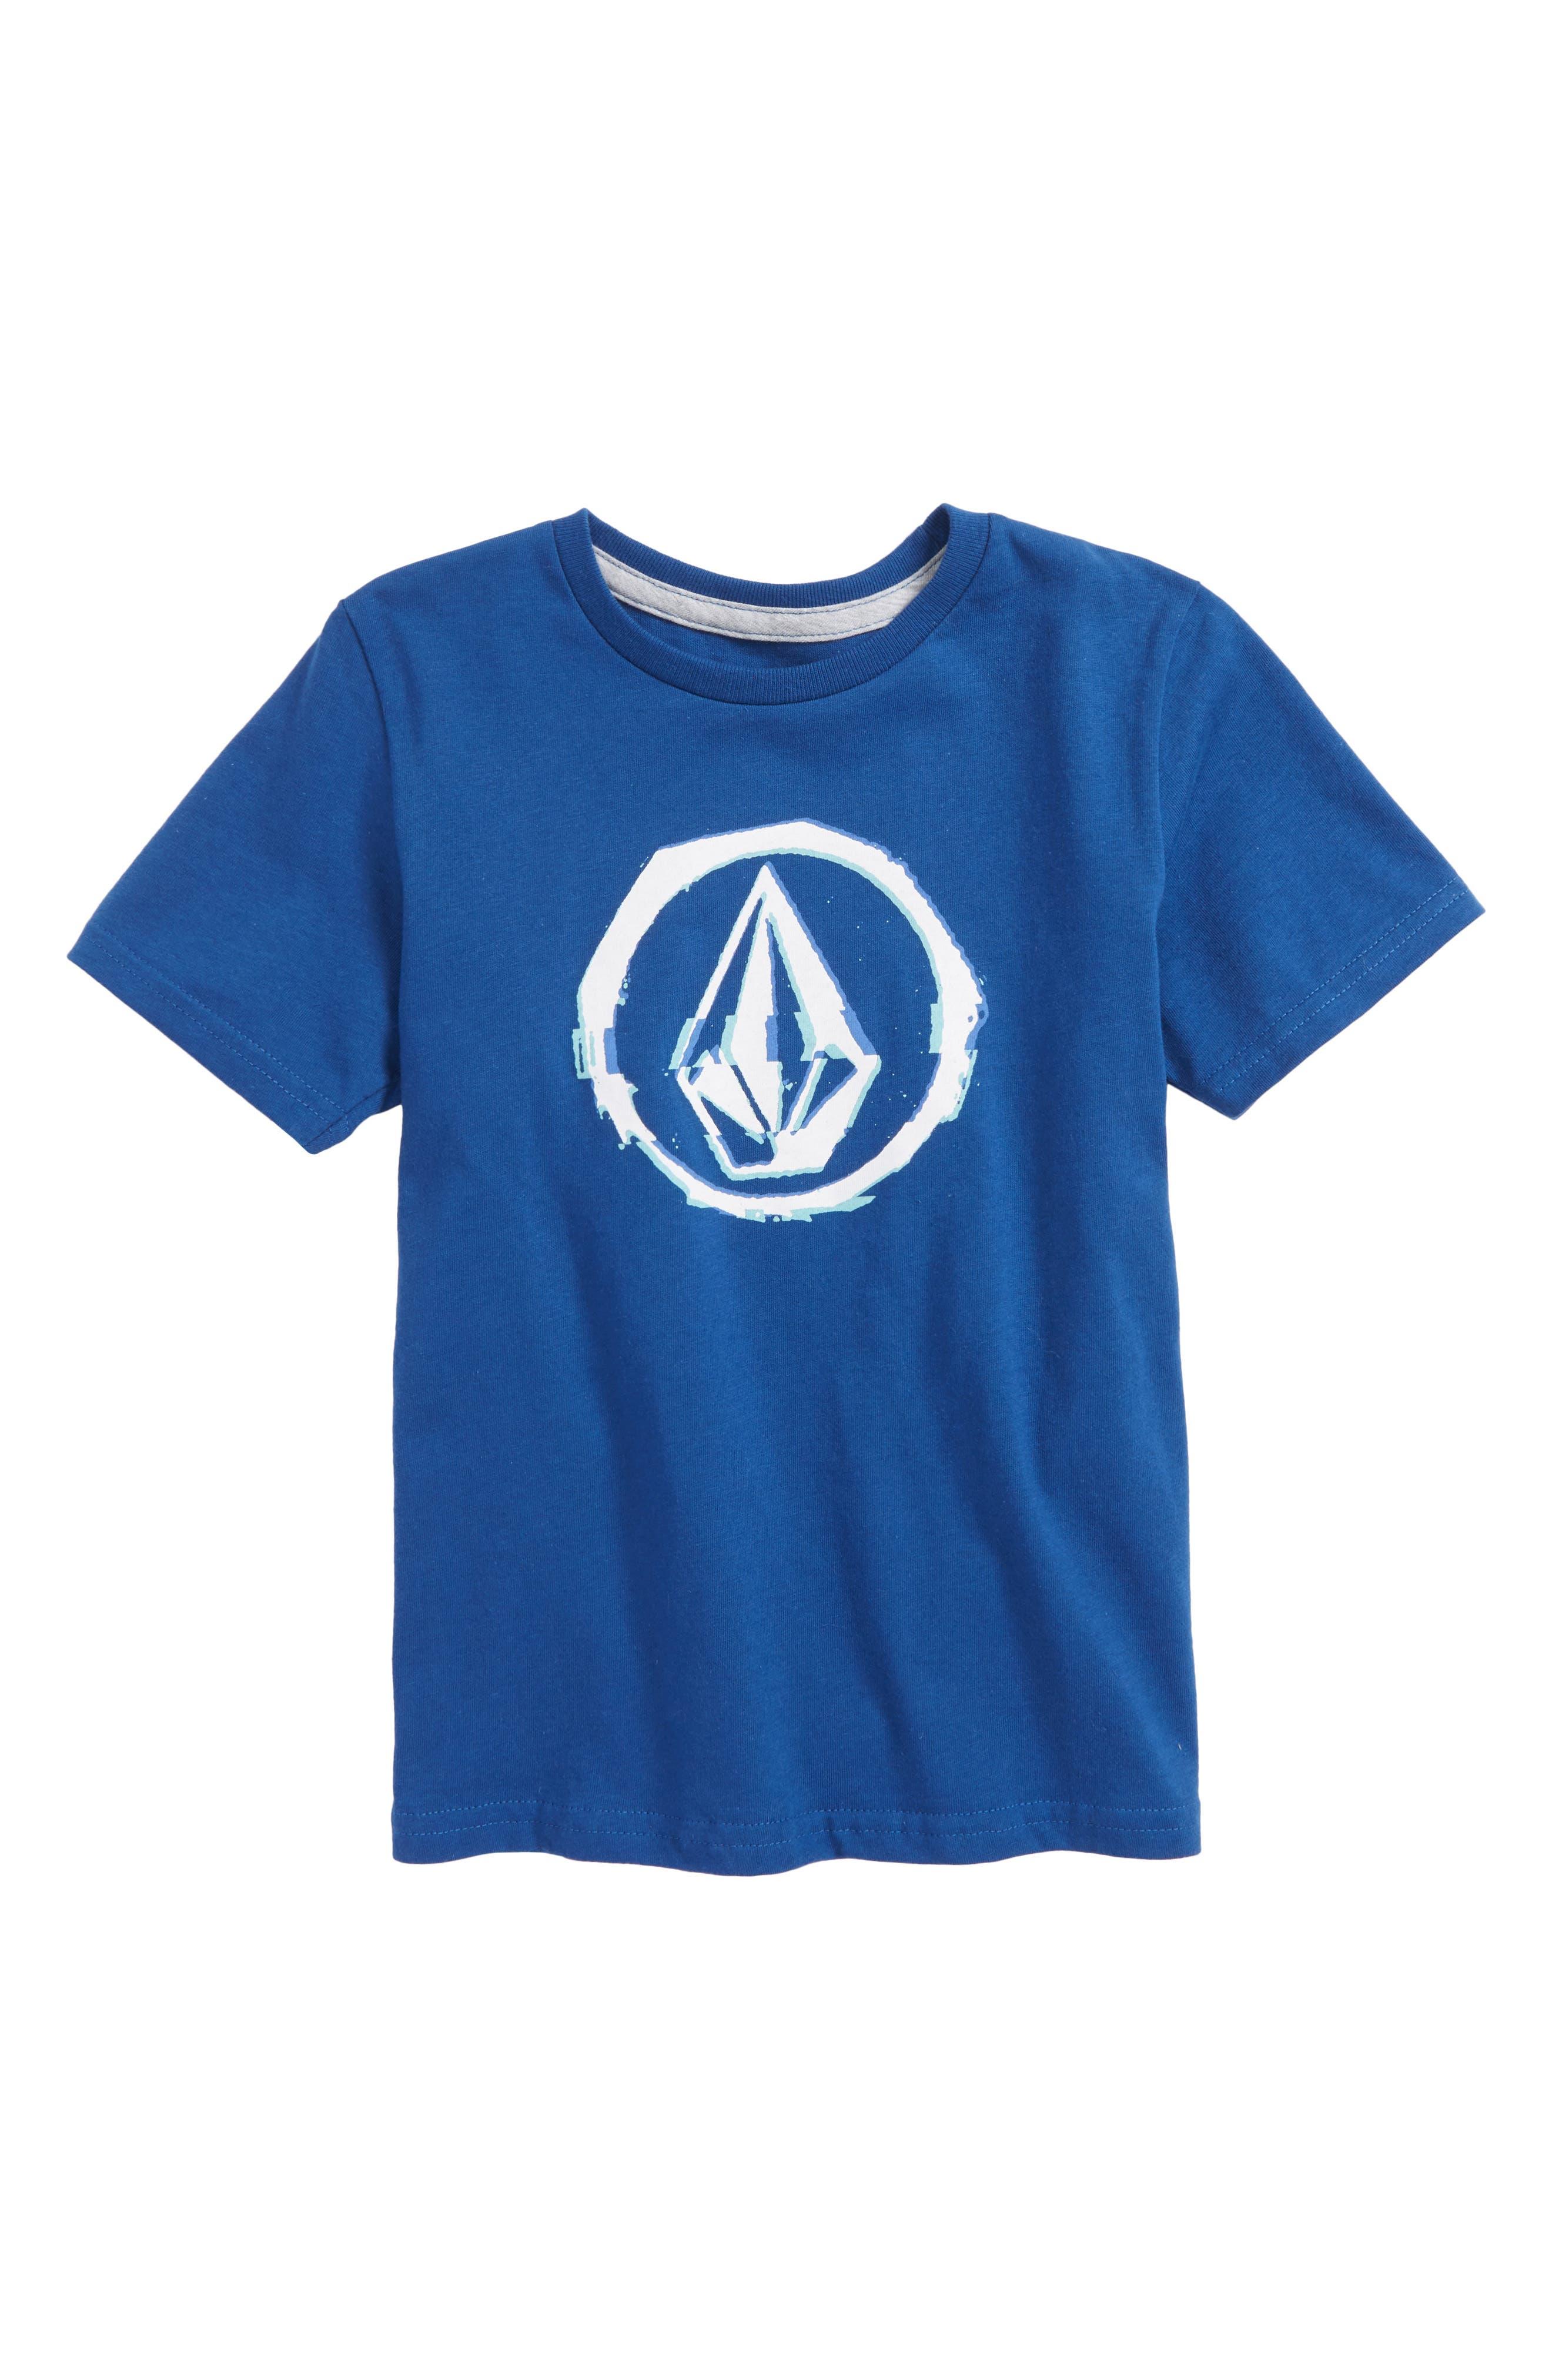 Glitchy Graphic T-Shirt,                             Main thumbnail 1, color,                             Camper Blue